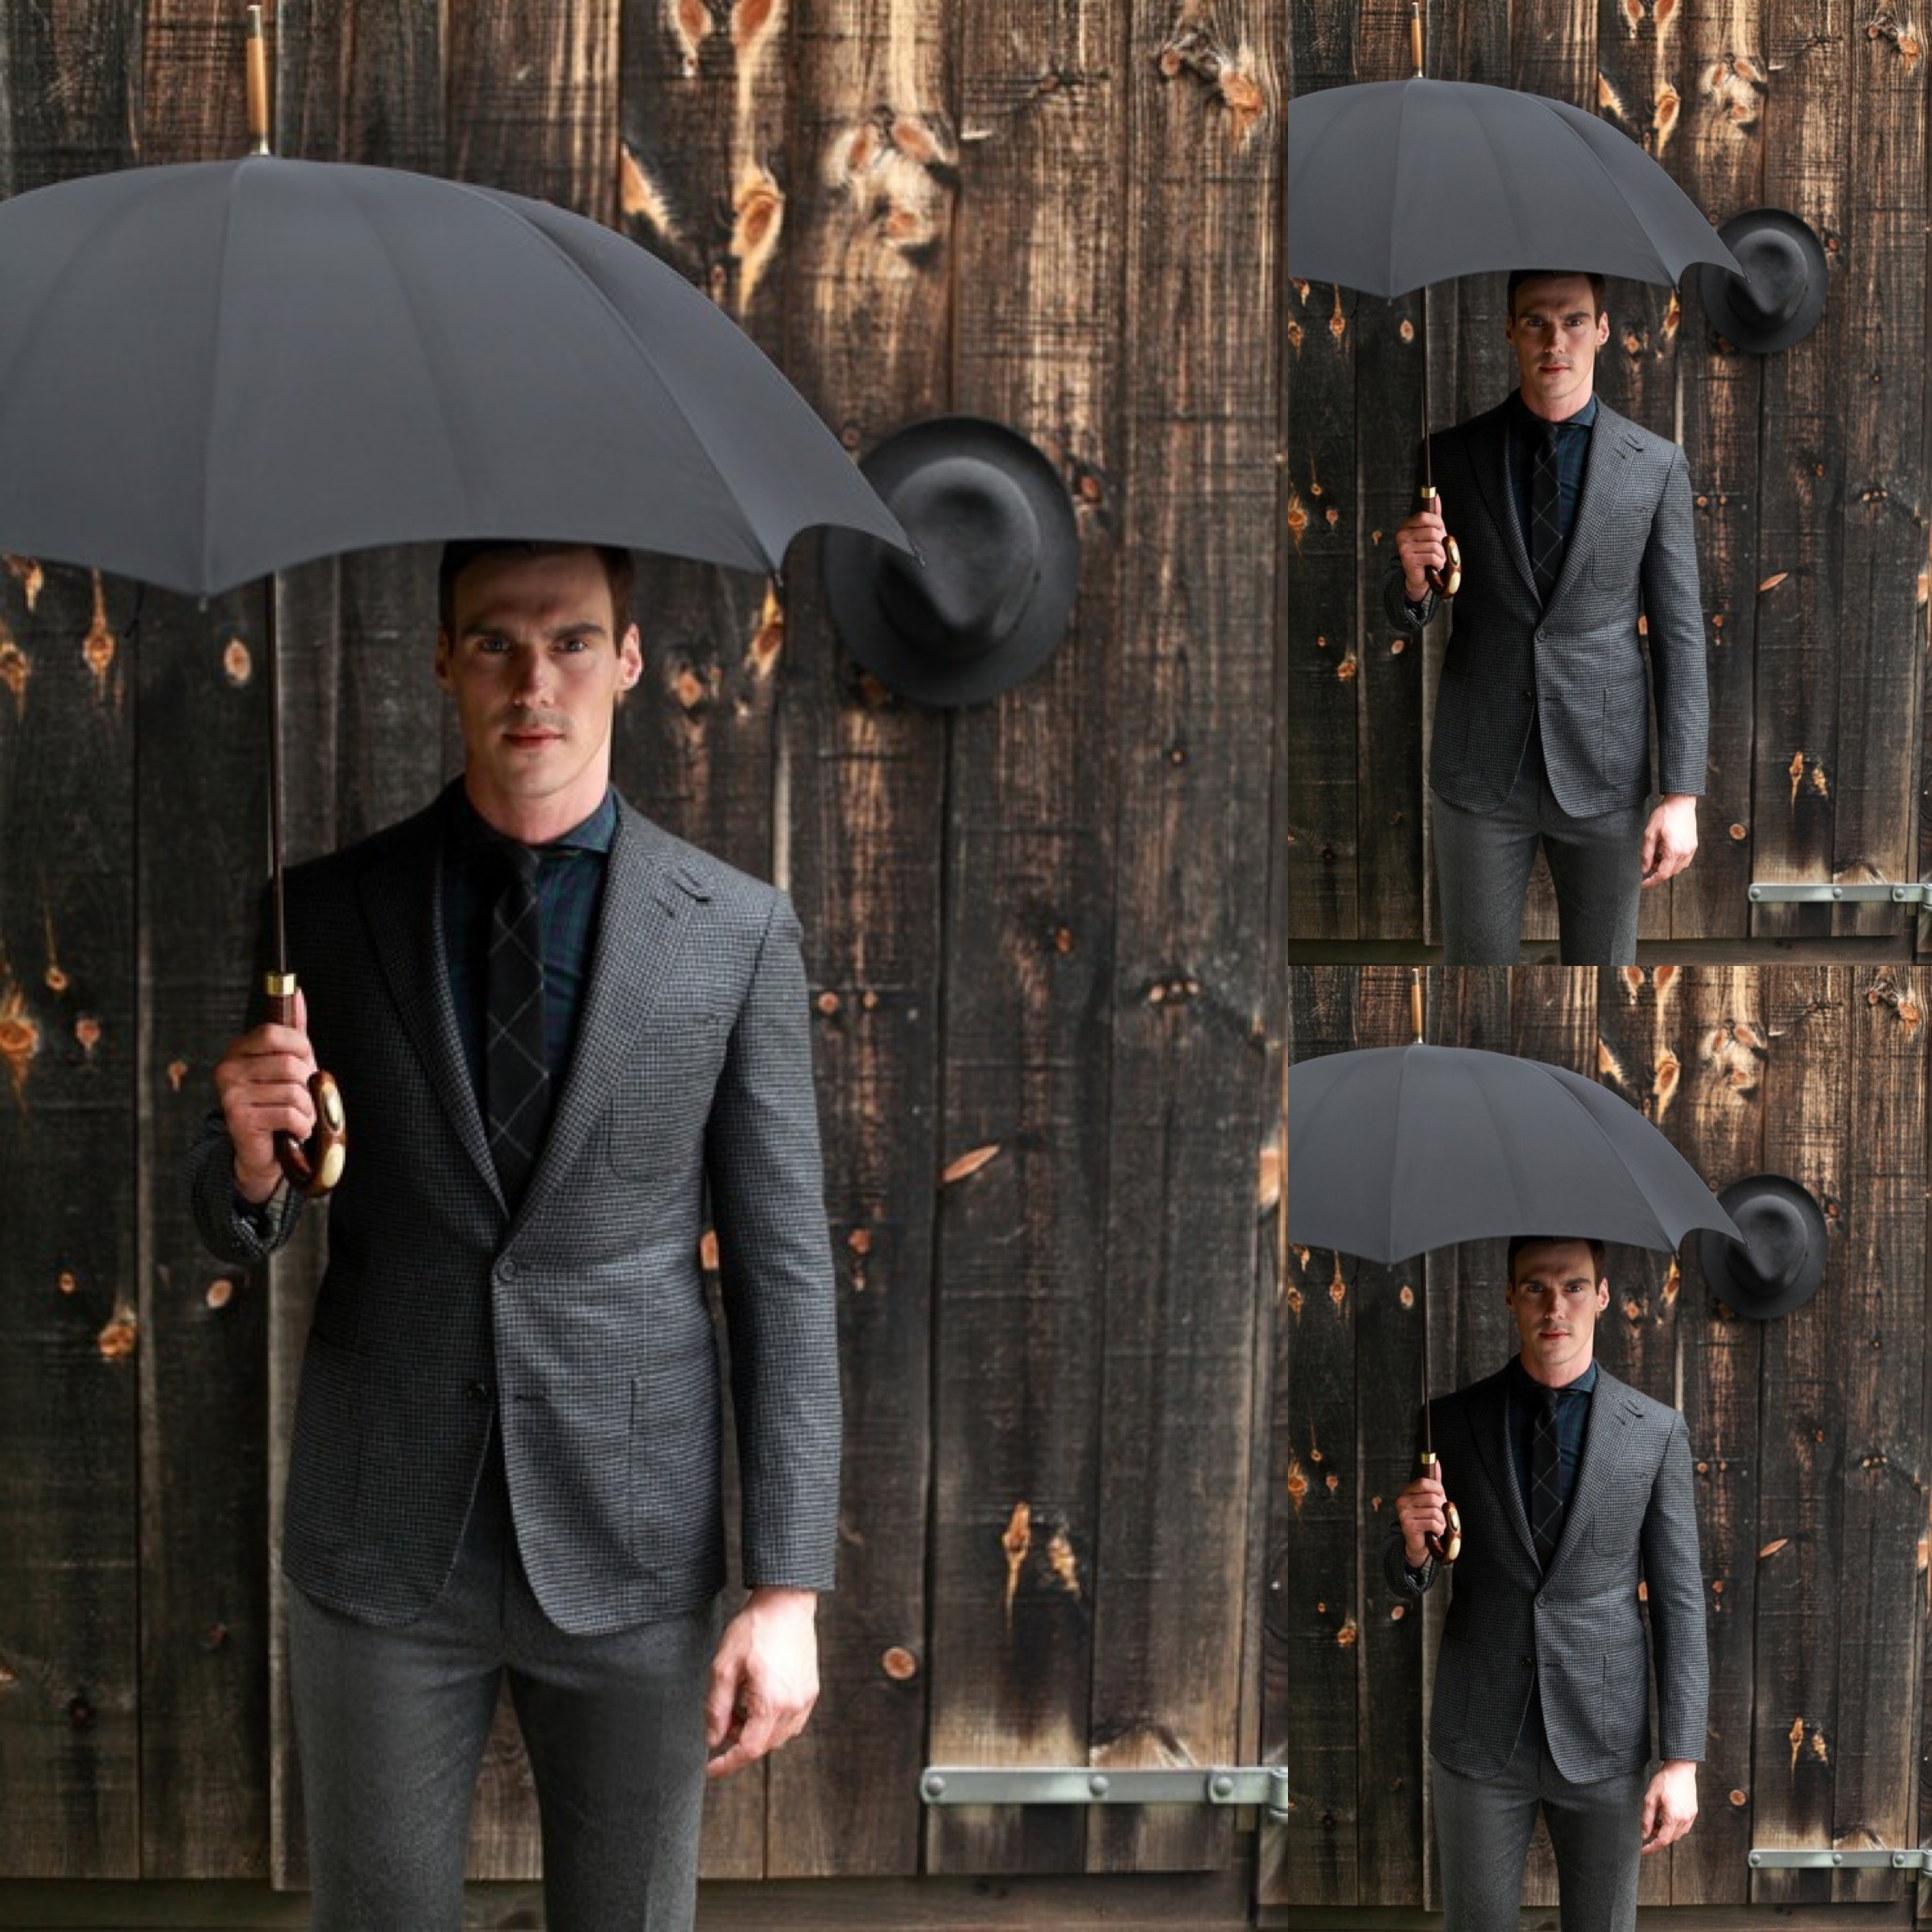 The Man Has Style - Rainy Days